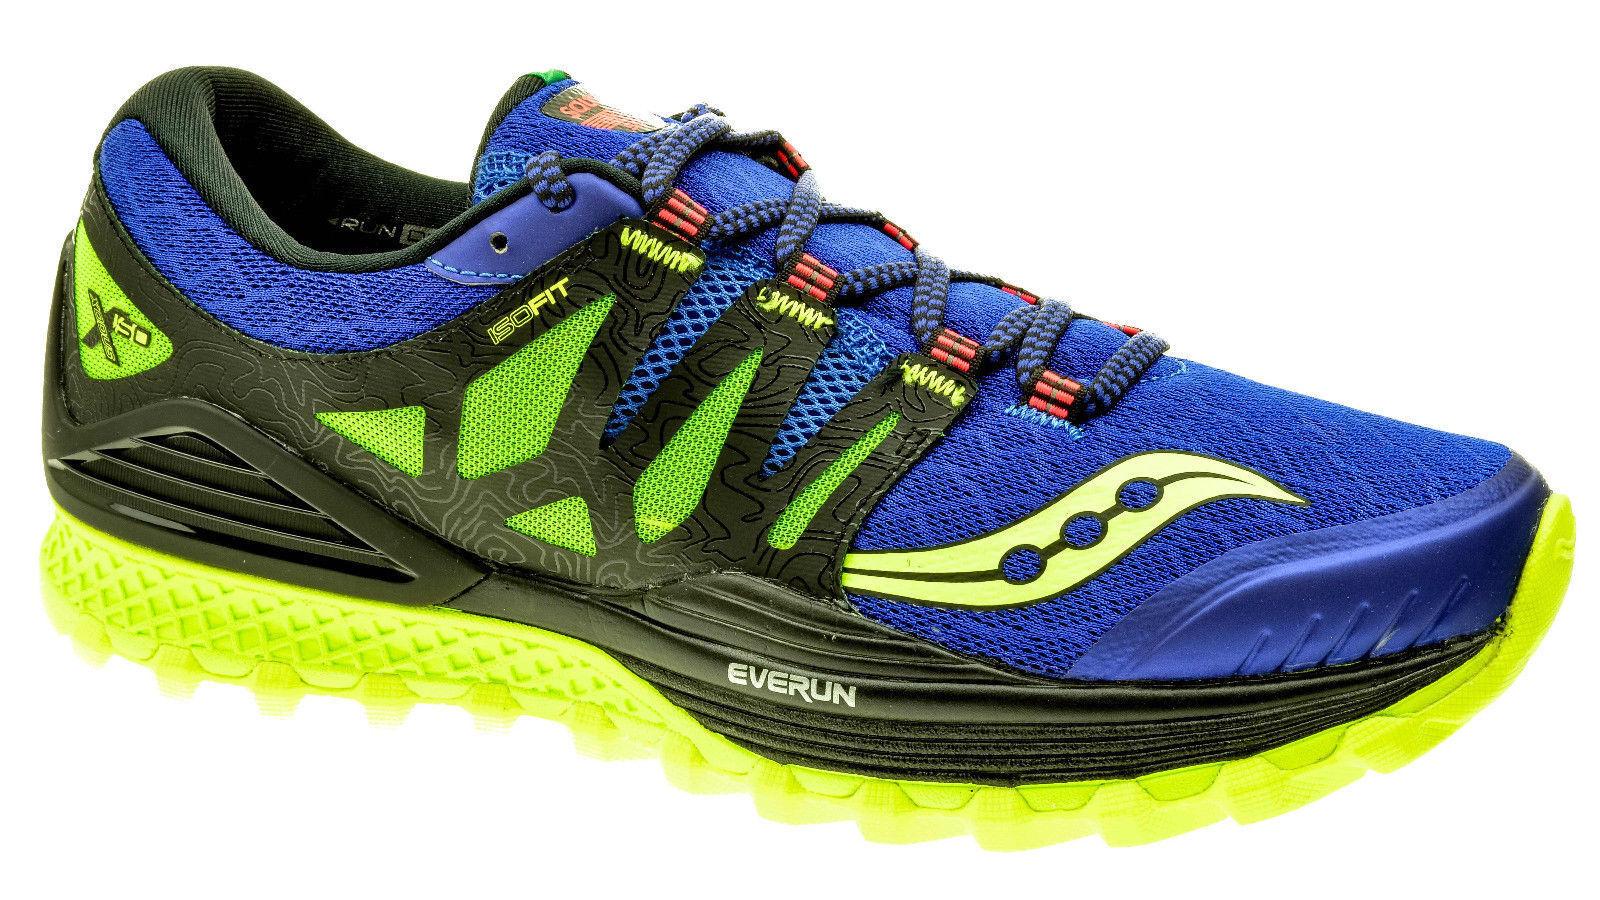 Saucony Men's XODUS ISO 2 bluee Black Citron Running shoes